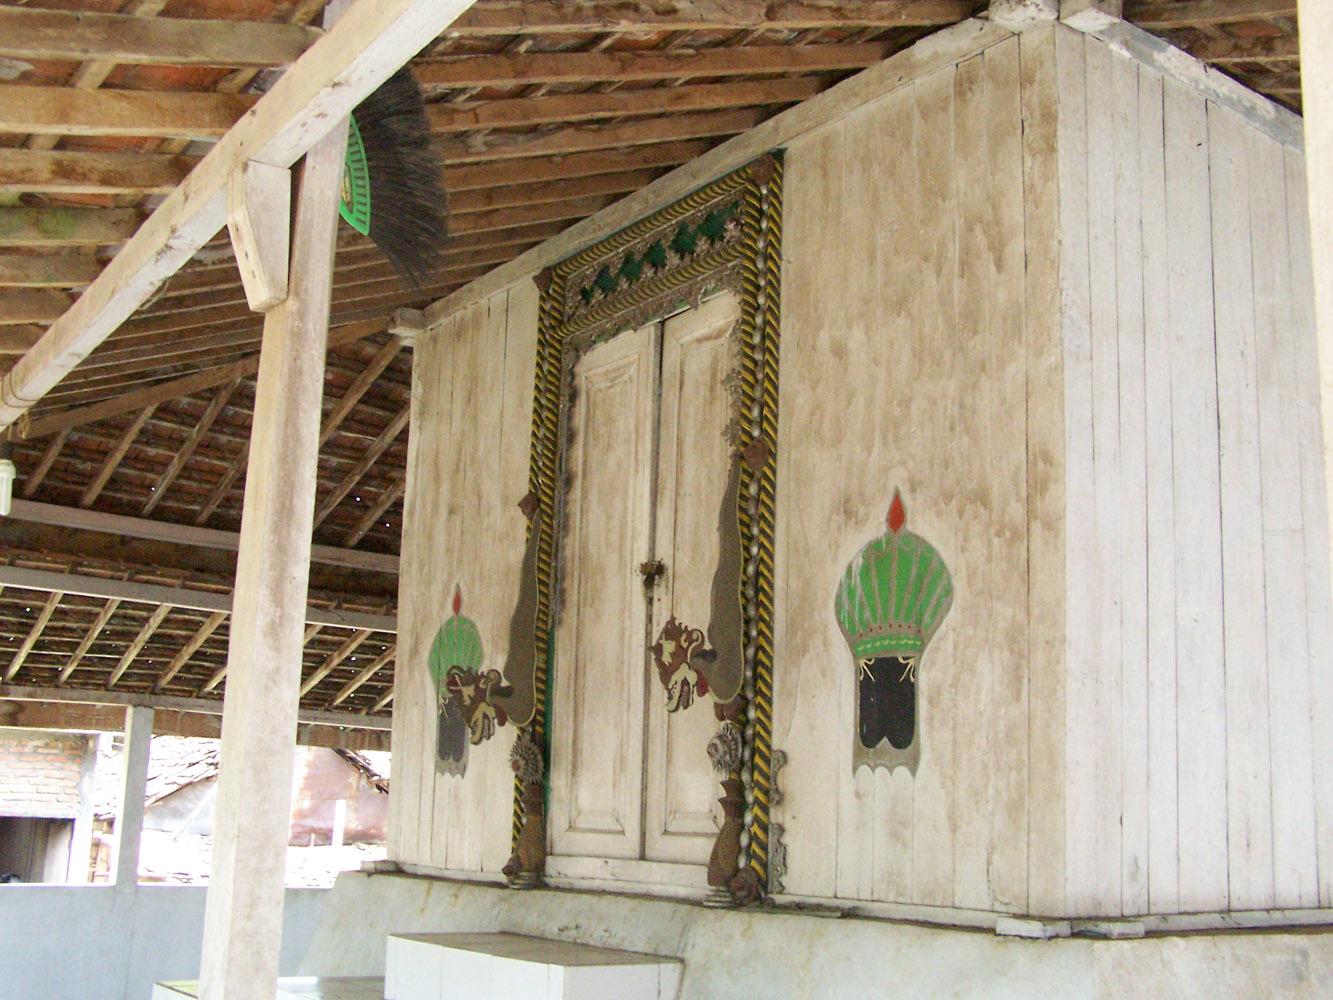 Menelusuri Jejak Ibu Sunan Giri Lamongan Info Kabupaten Makam Dewi